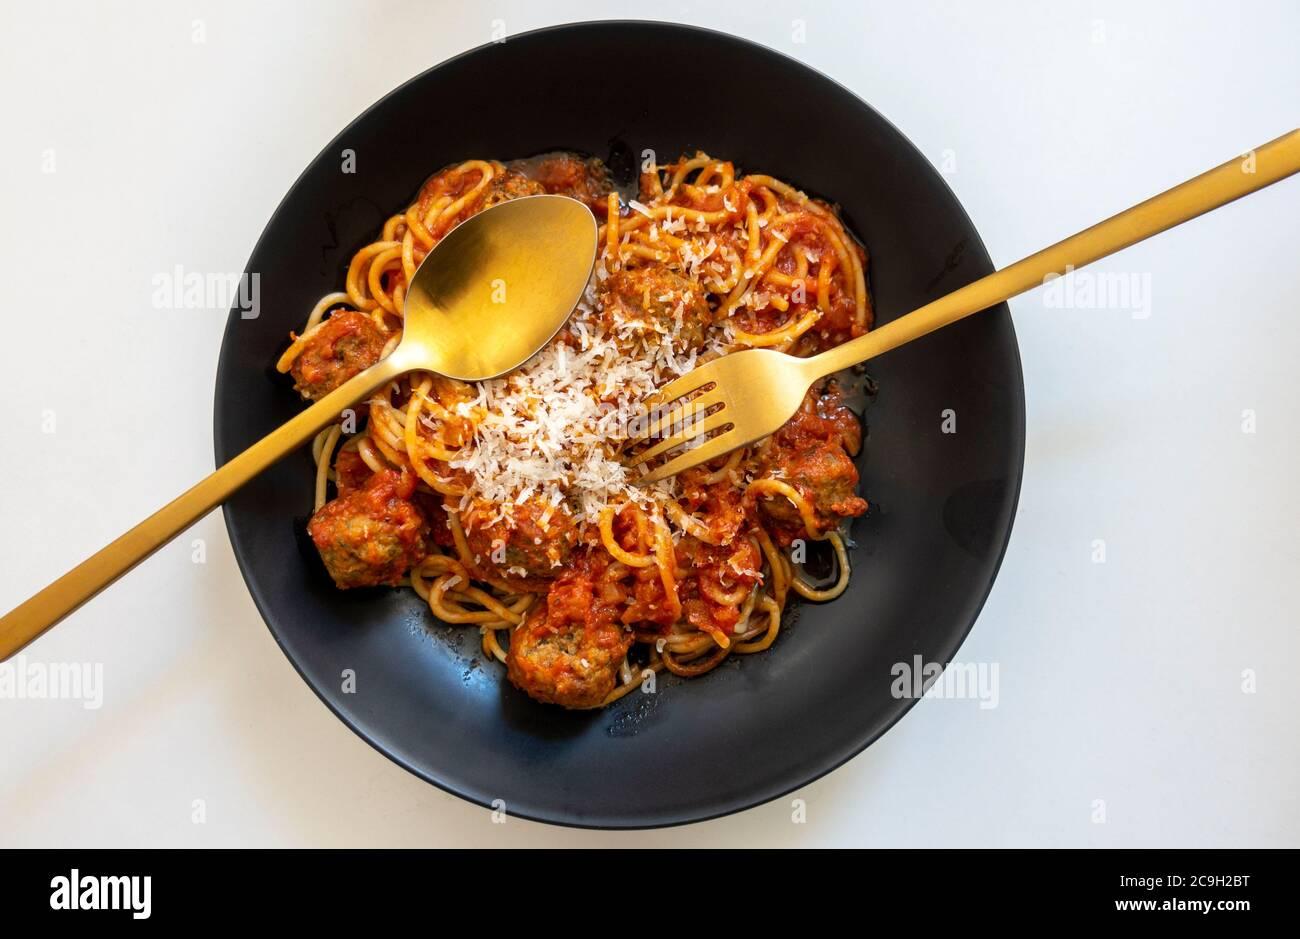 spaghetti-and-meatballs-2C9H2BT.jpg